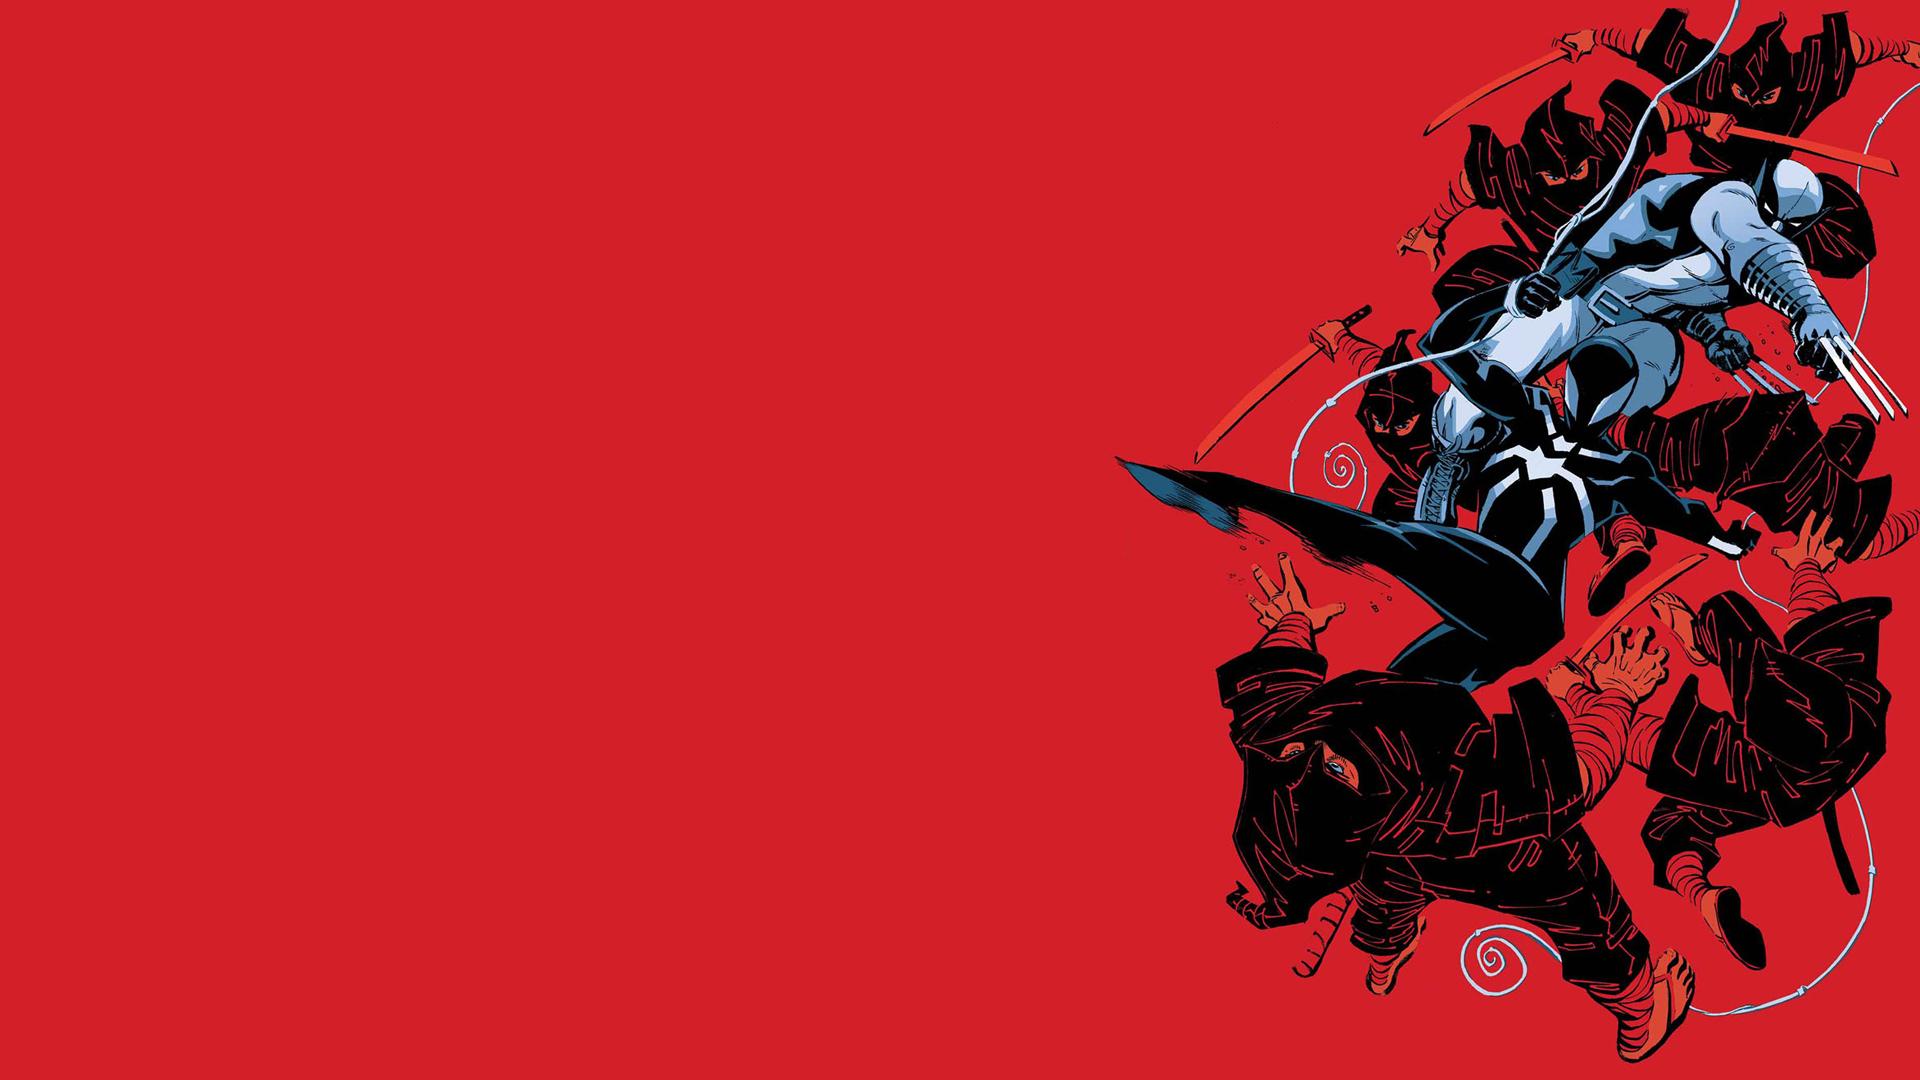 Comics X Men Wolverine X Men 23263 Hd Wallpaper